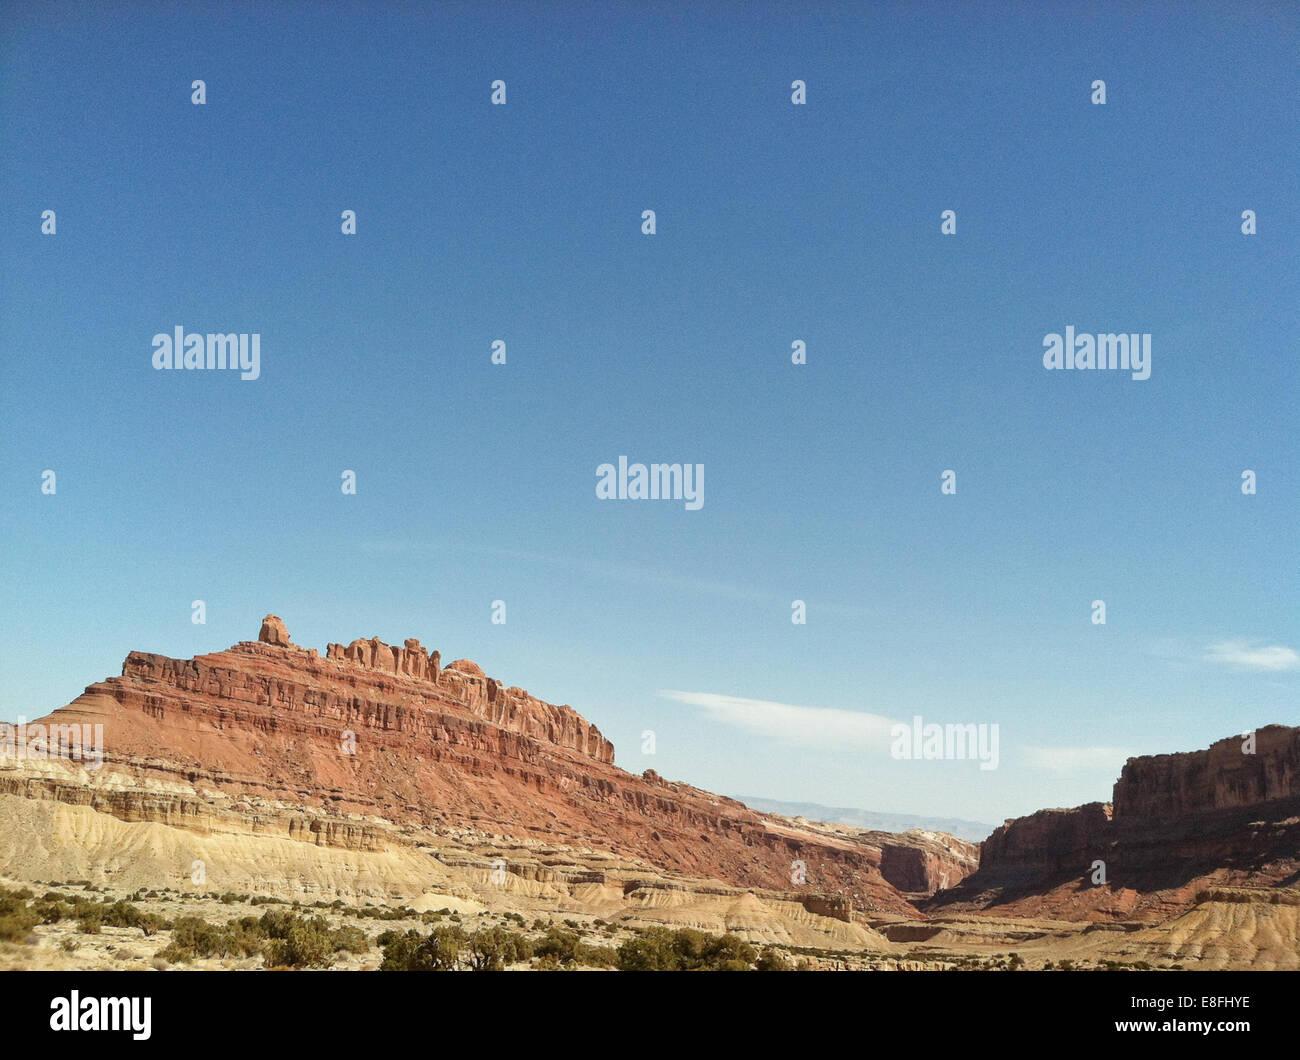 Mountains in desert - Stock Image